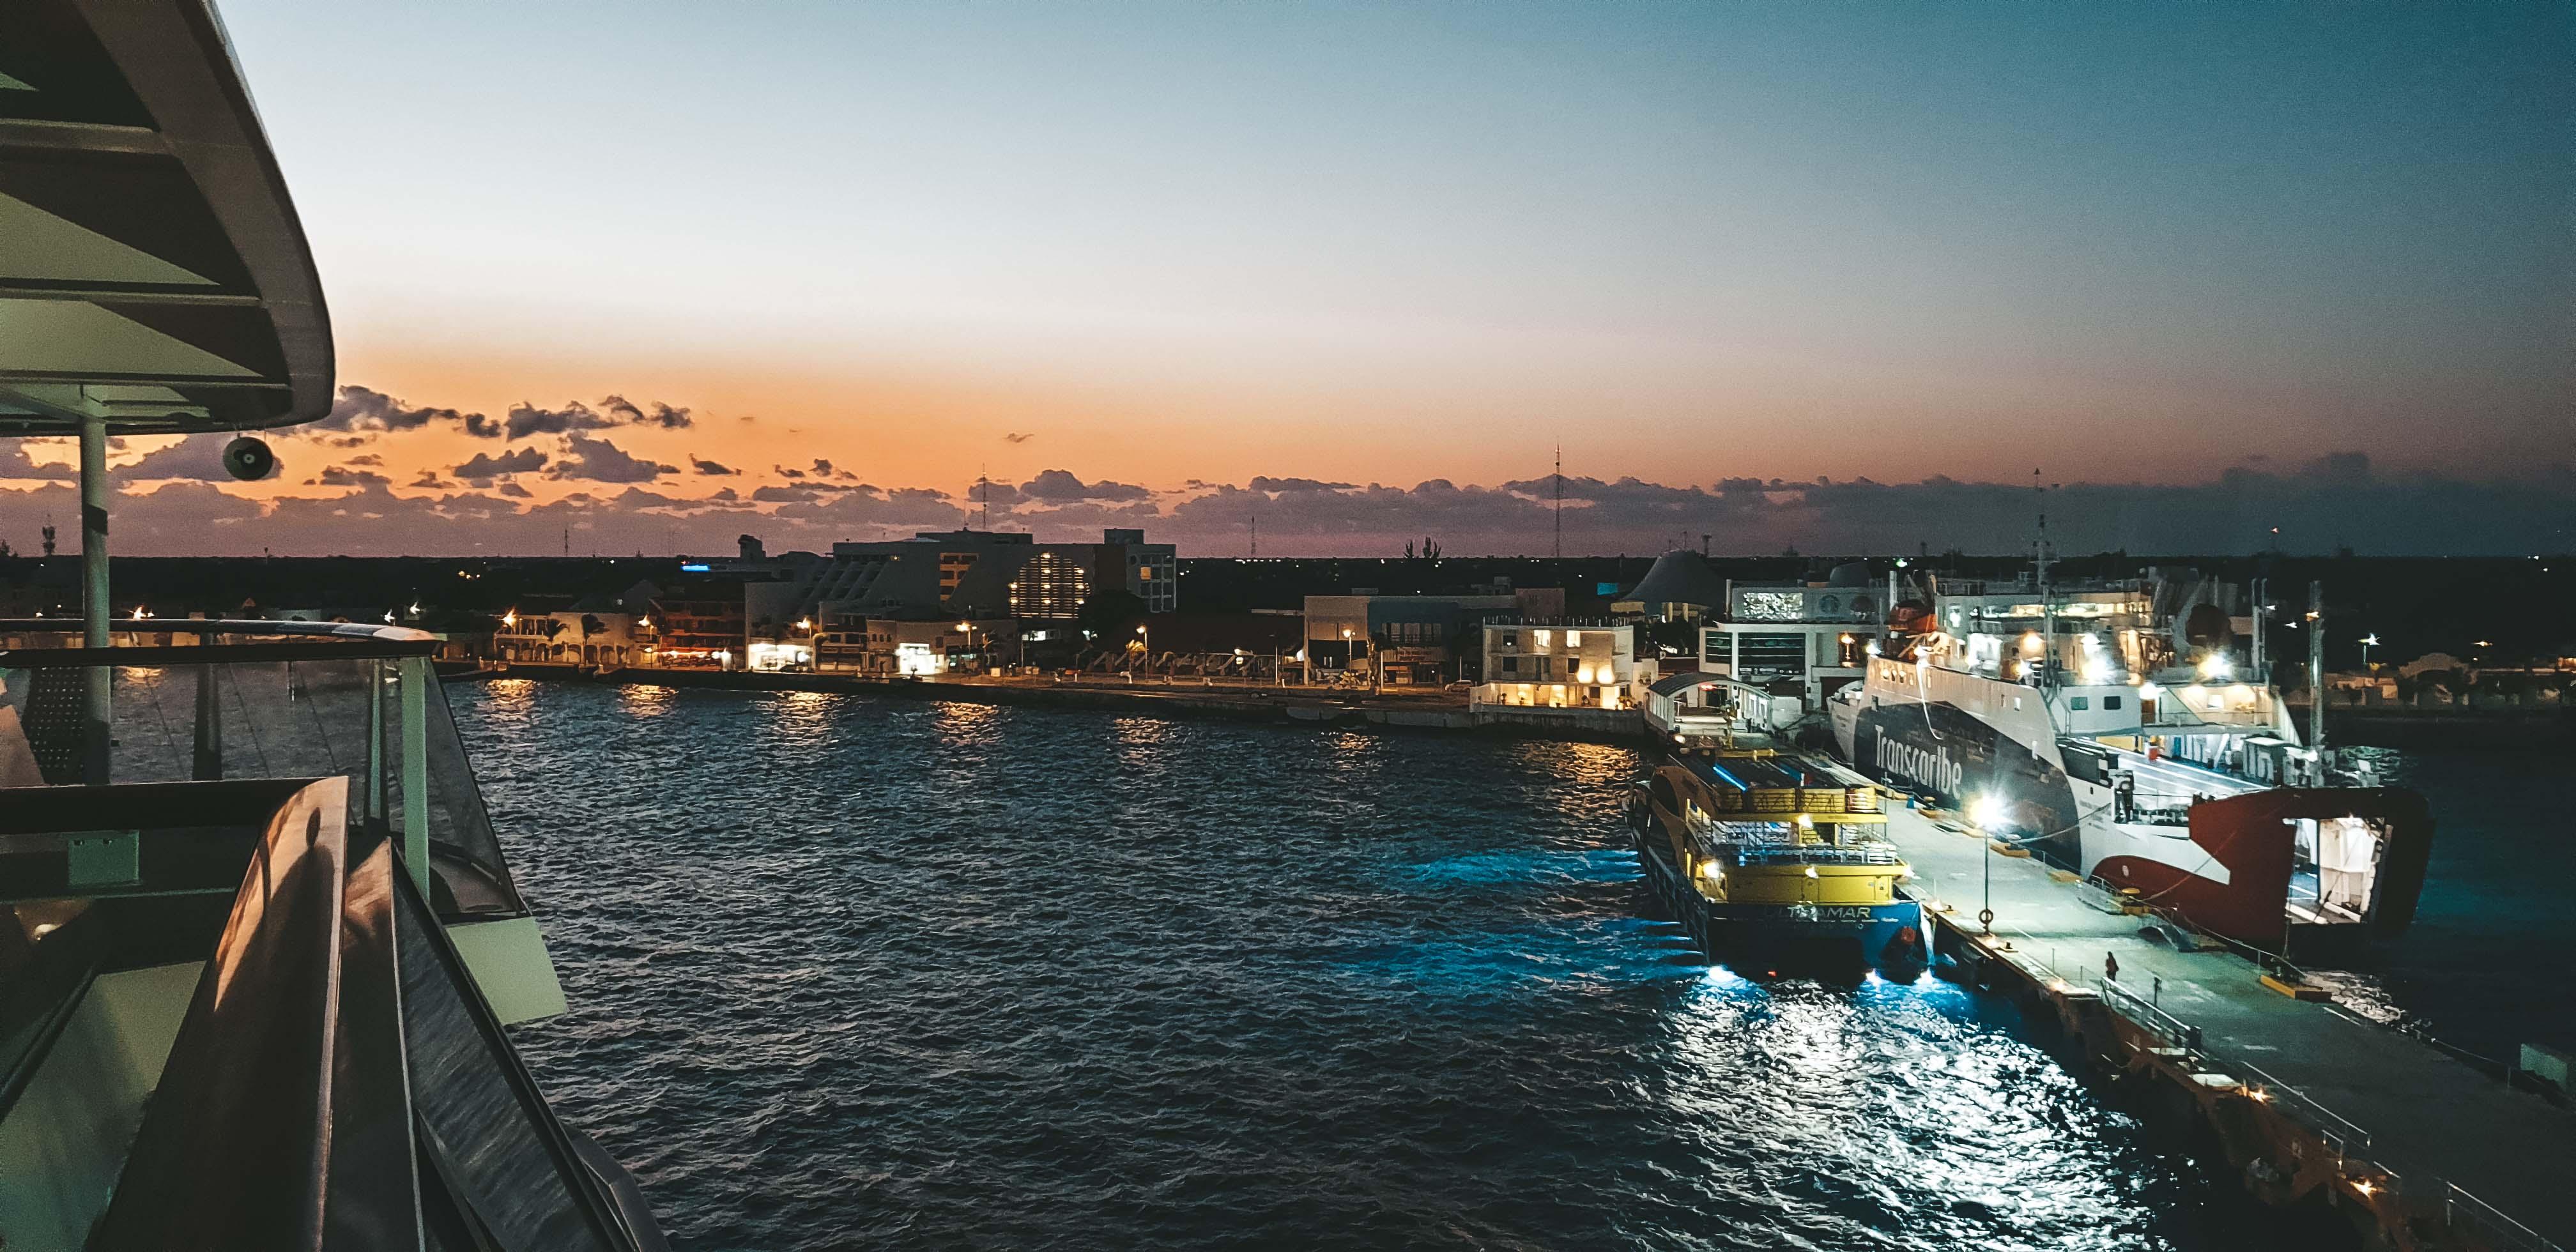 Mittelamerika Kreuzfahrt Cozumel Mexiko Hafen Sonnenaufgang